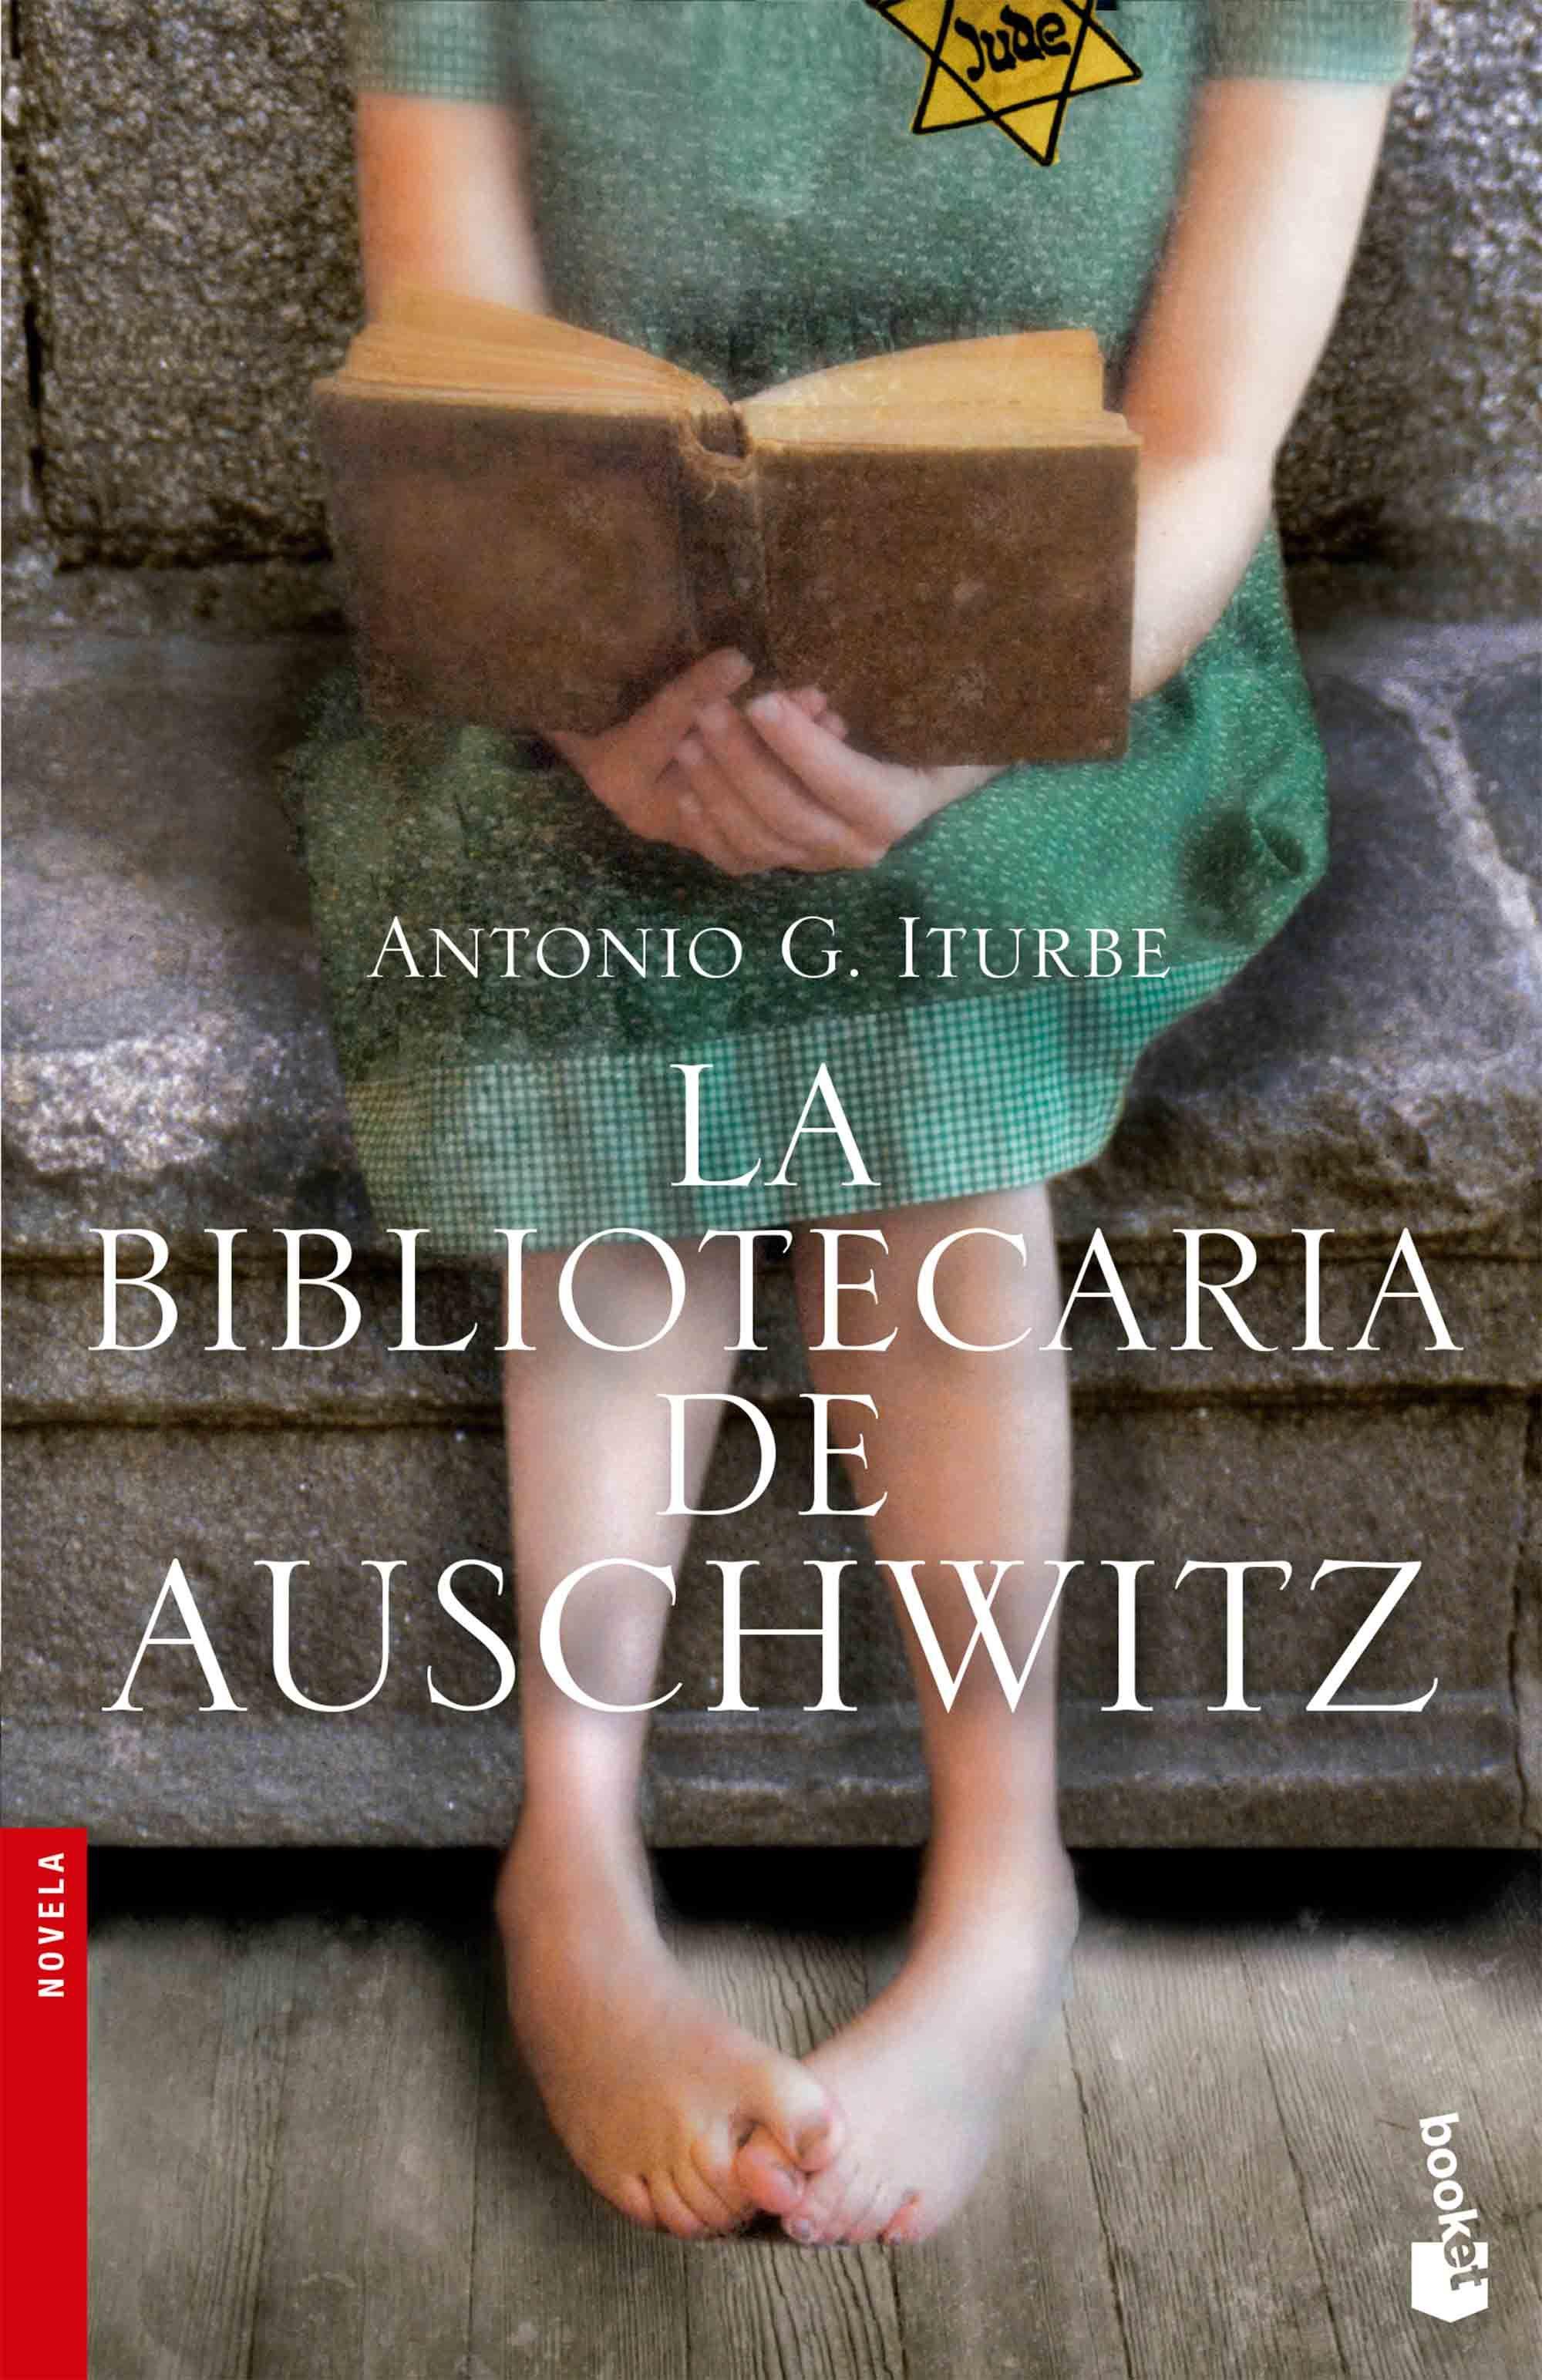 La Bibliotecaria de Auschwitz - Antonio G. Iturbe - Booket